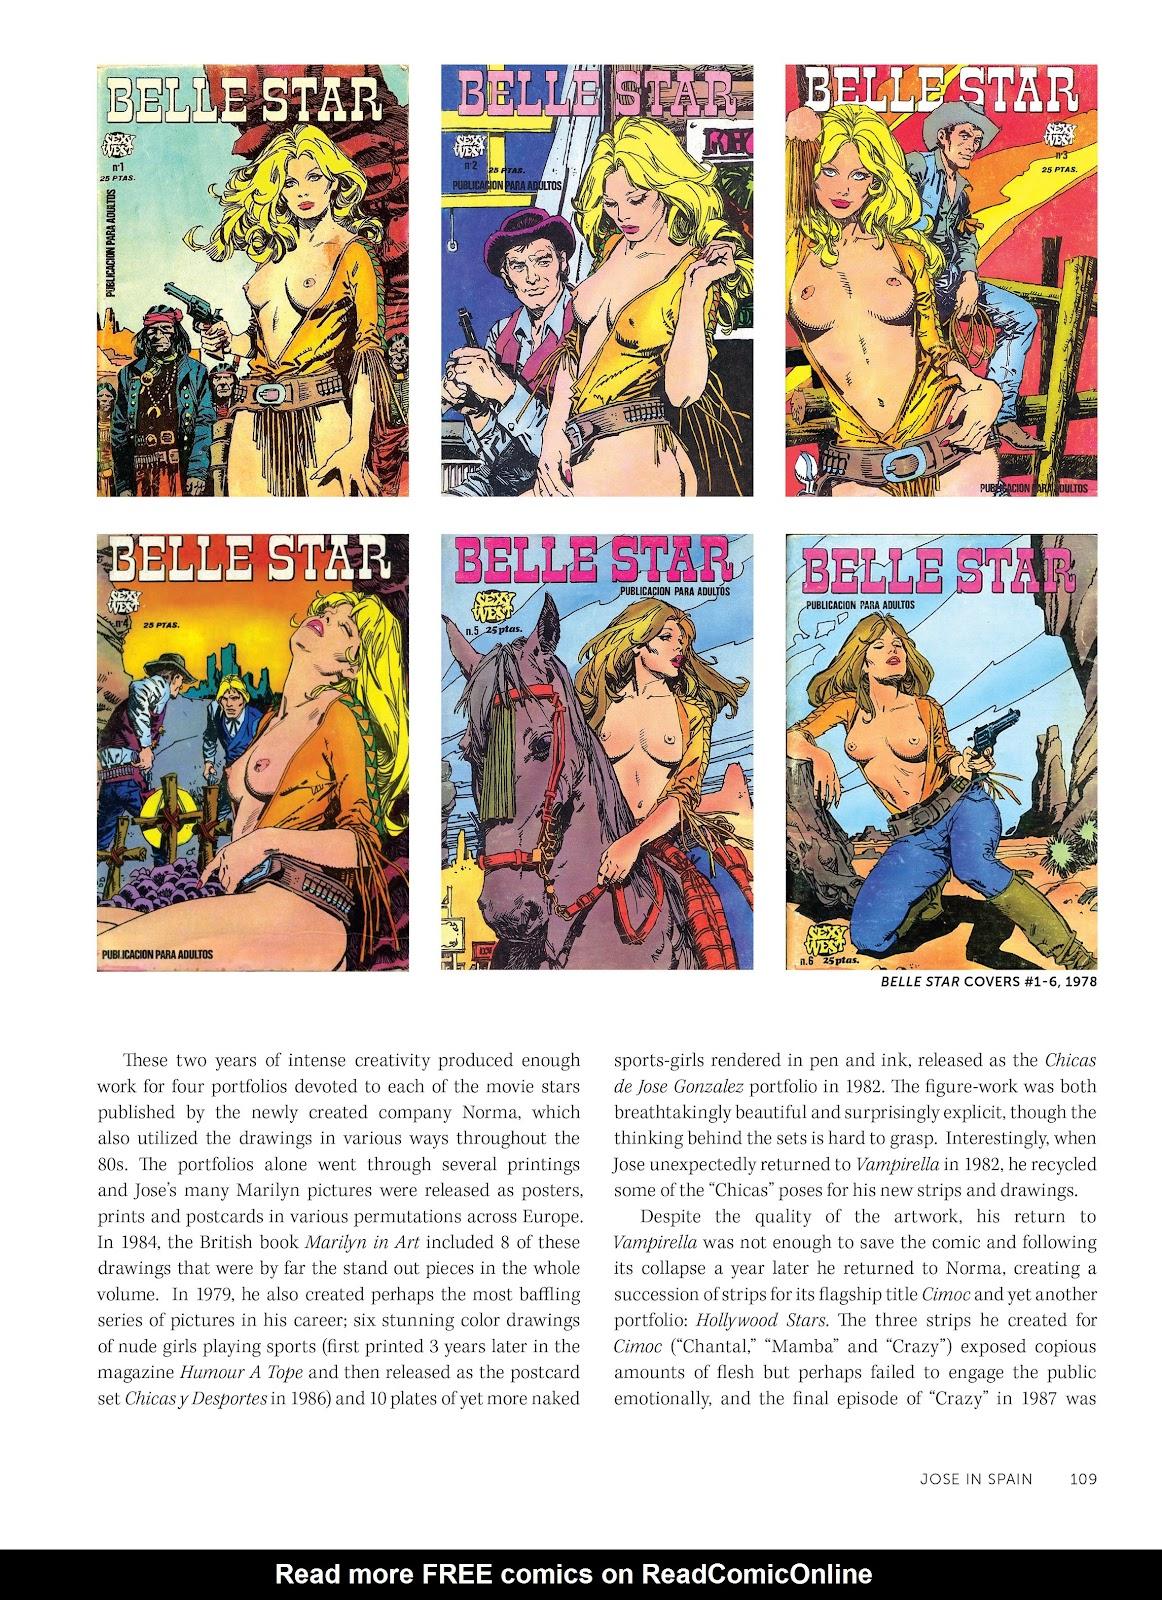 Read online The Art of Jose Gonzalez comic -  Issue # TPB (Part 2) - 11